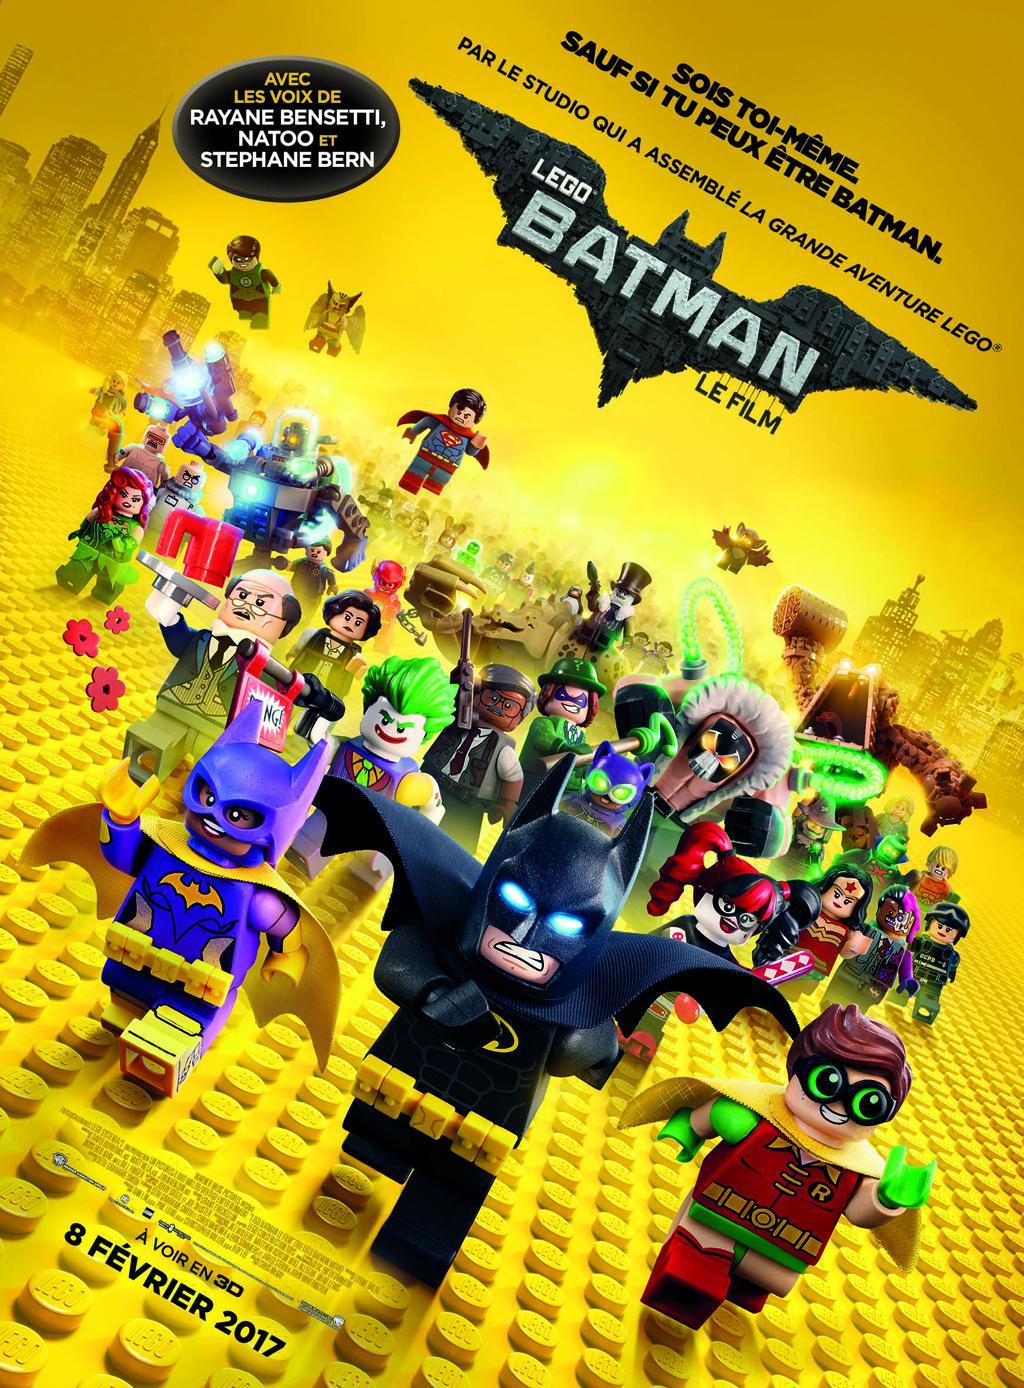 Critique de Lego Batman Le Film le spinoff de La